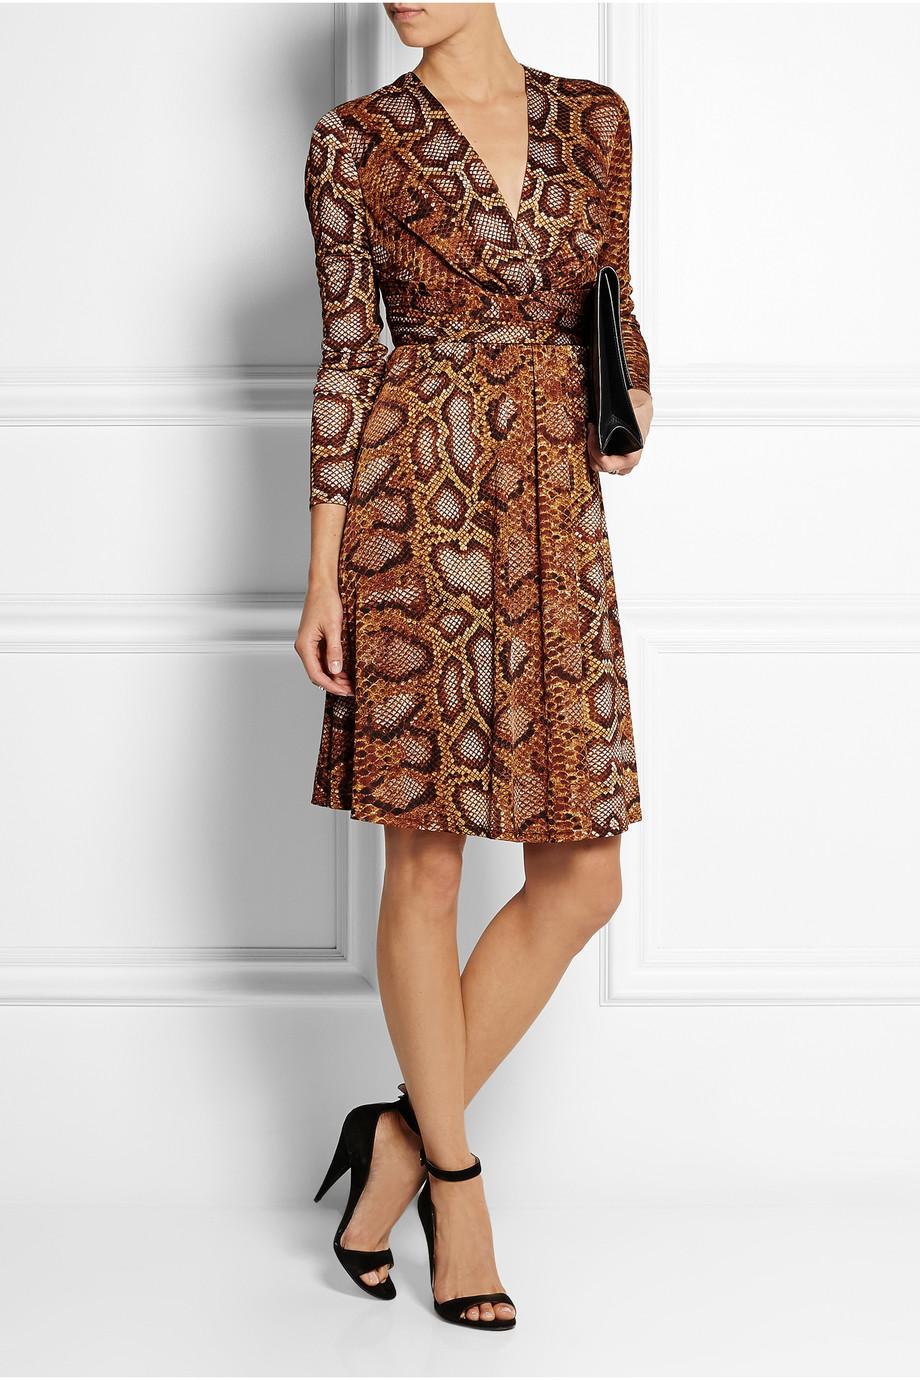 Python-print satin-jersey dress, £45